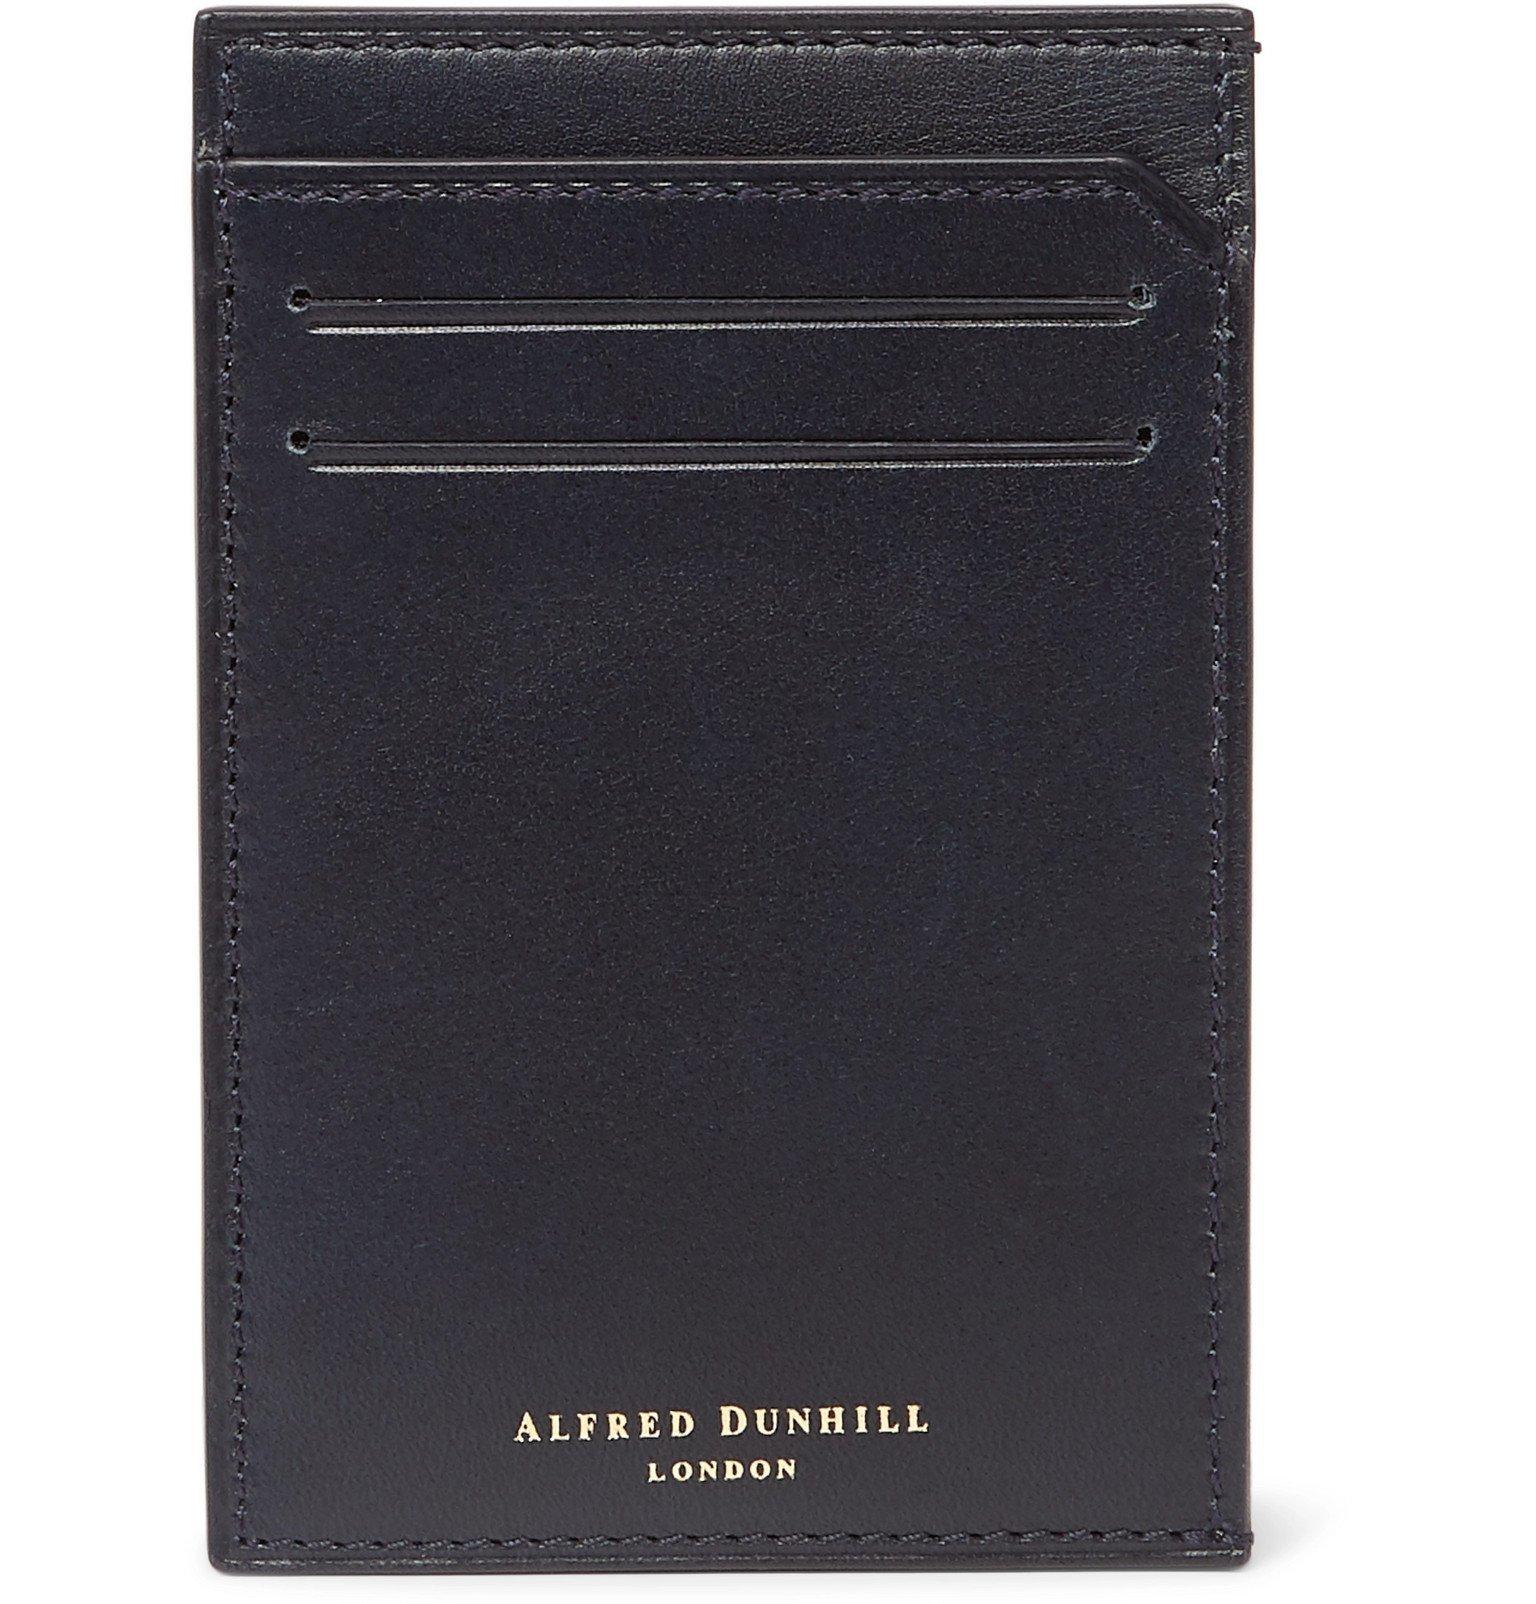 Dunhill - Leather Cardholder - Blue